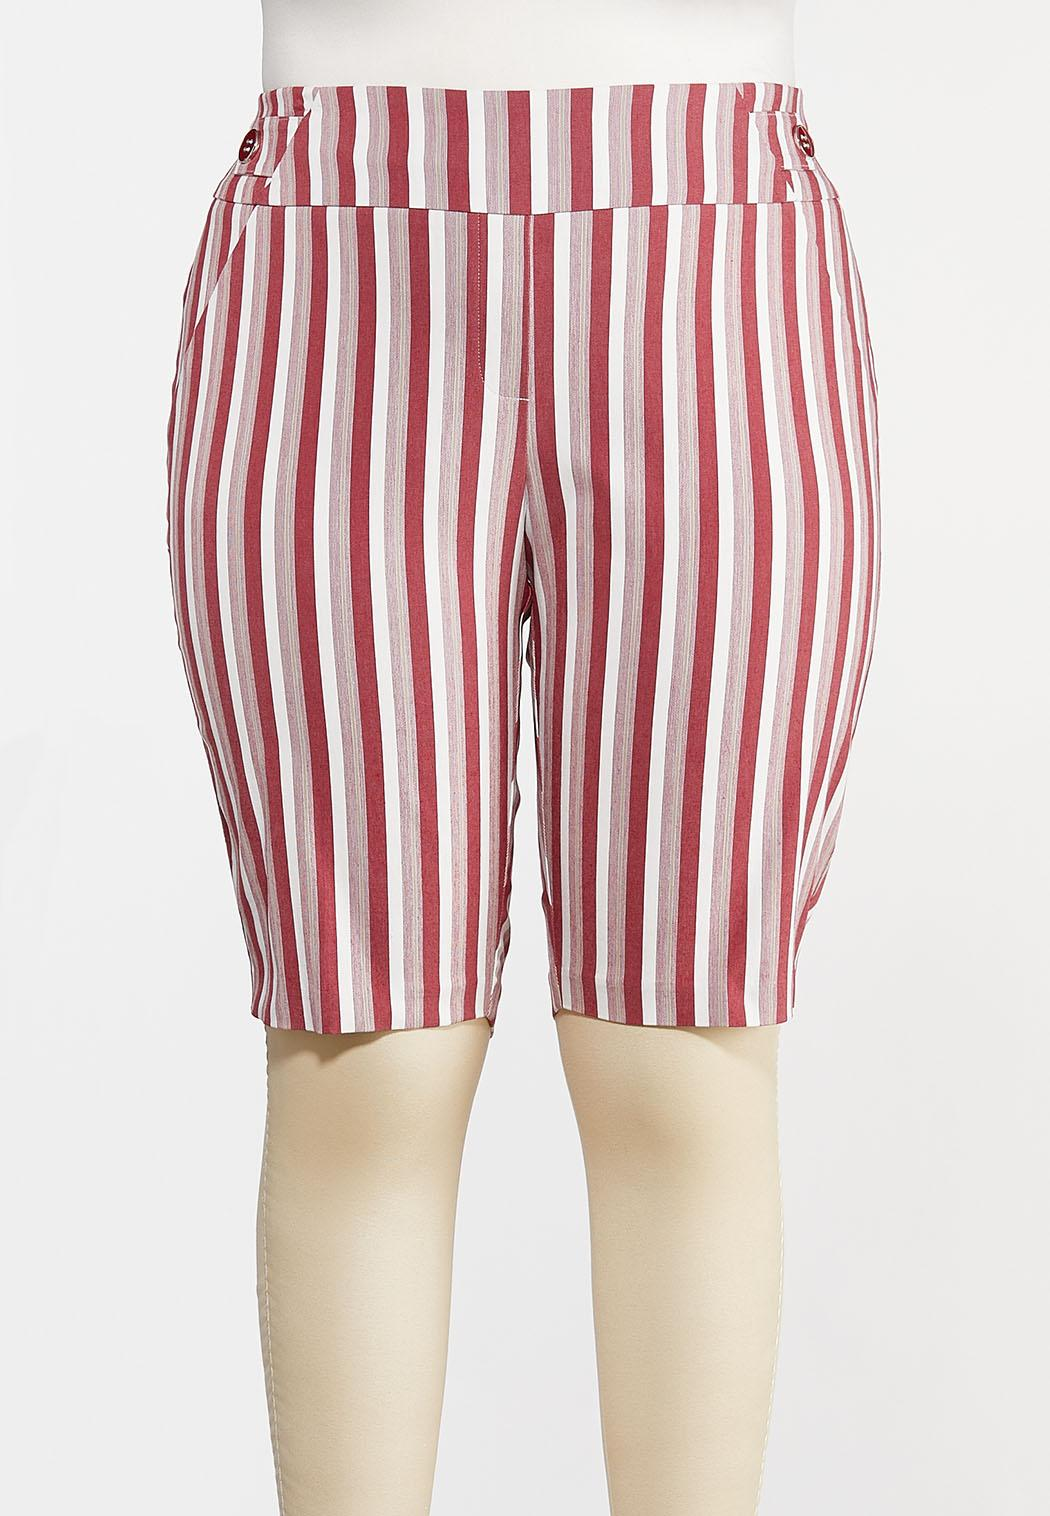 Plus Size Chili Stripe Bermuda Shorts